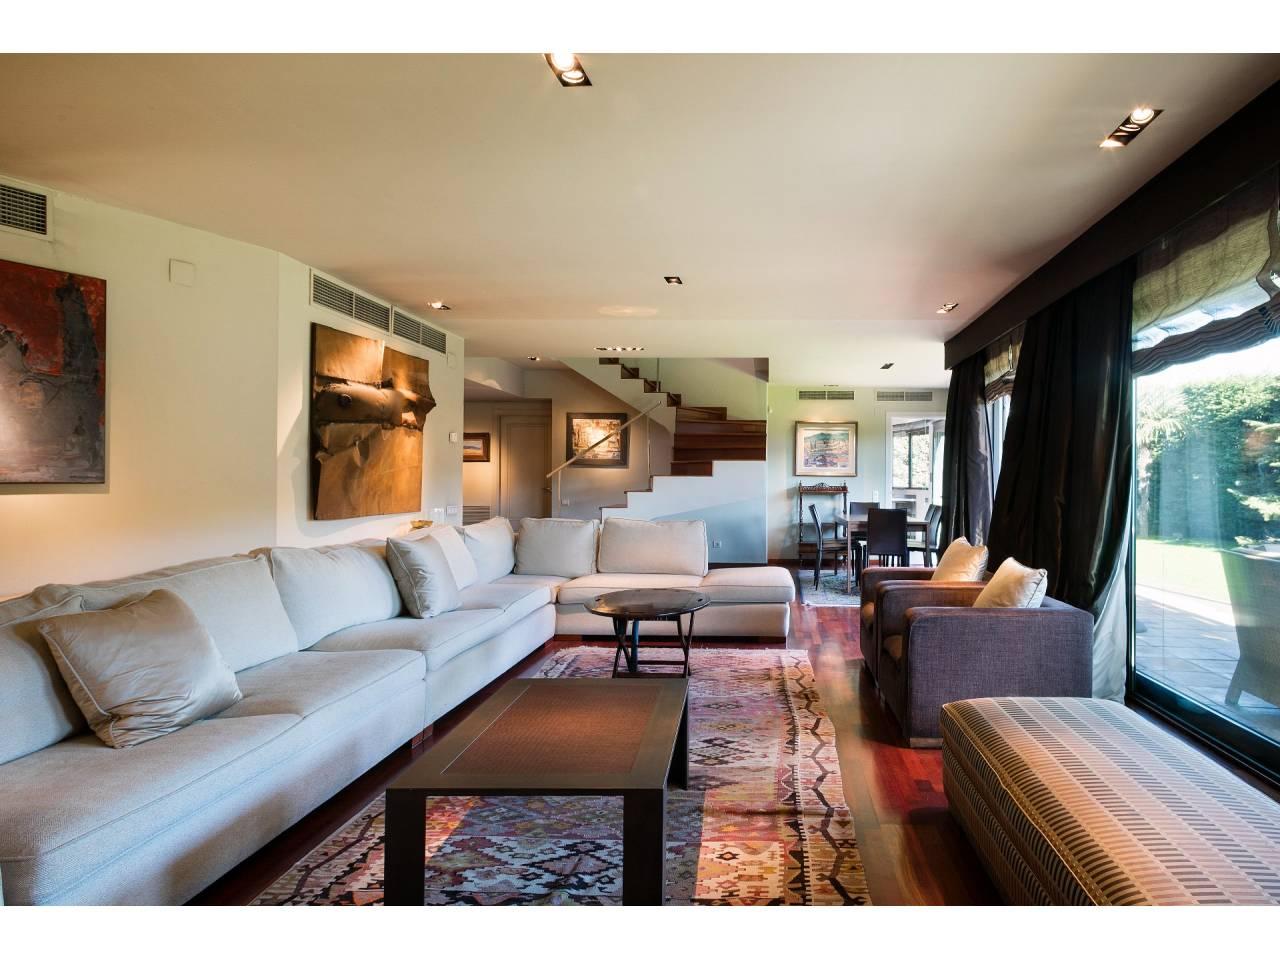 Moderna casa en alquiler de 380m² con jardín en Pedralbes